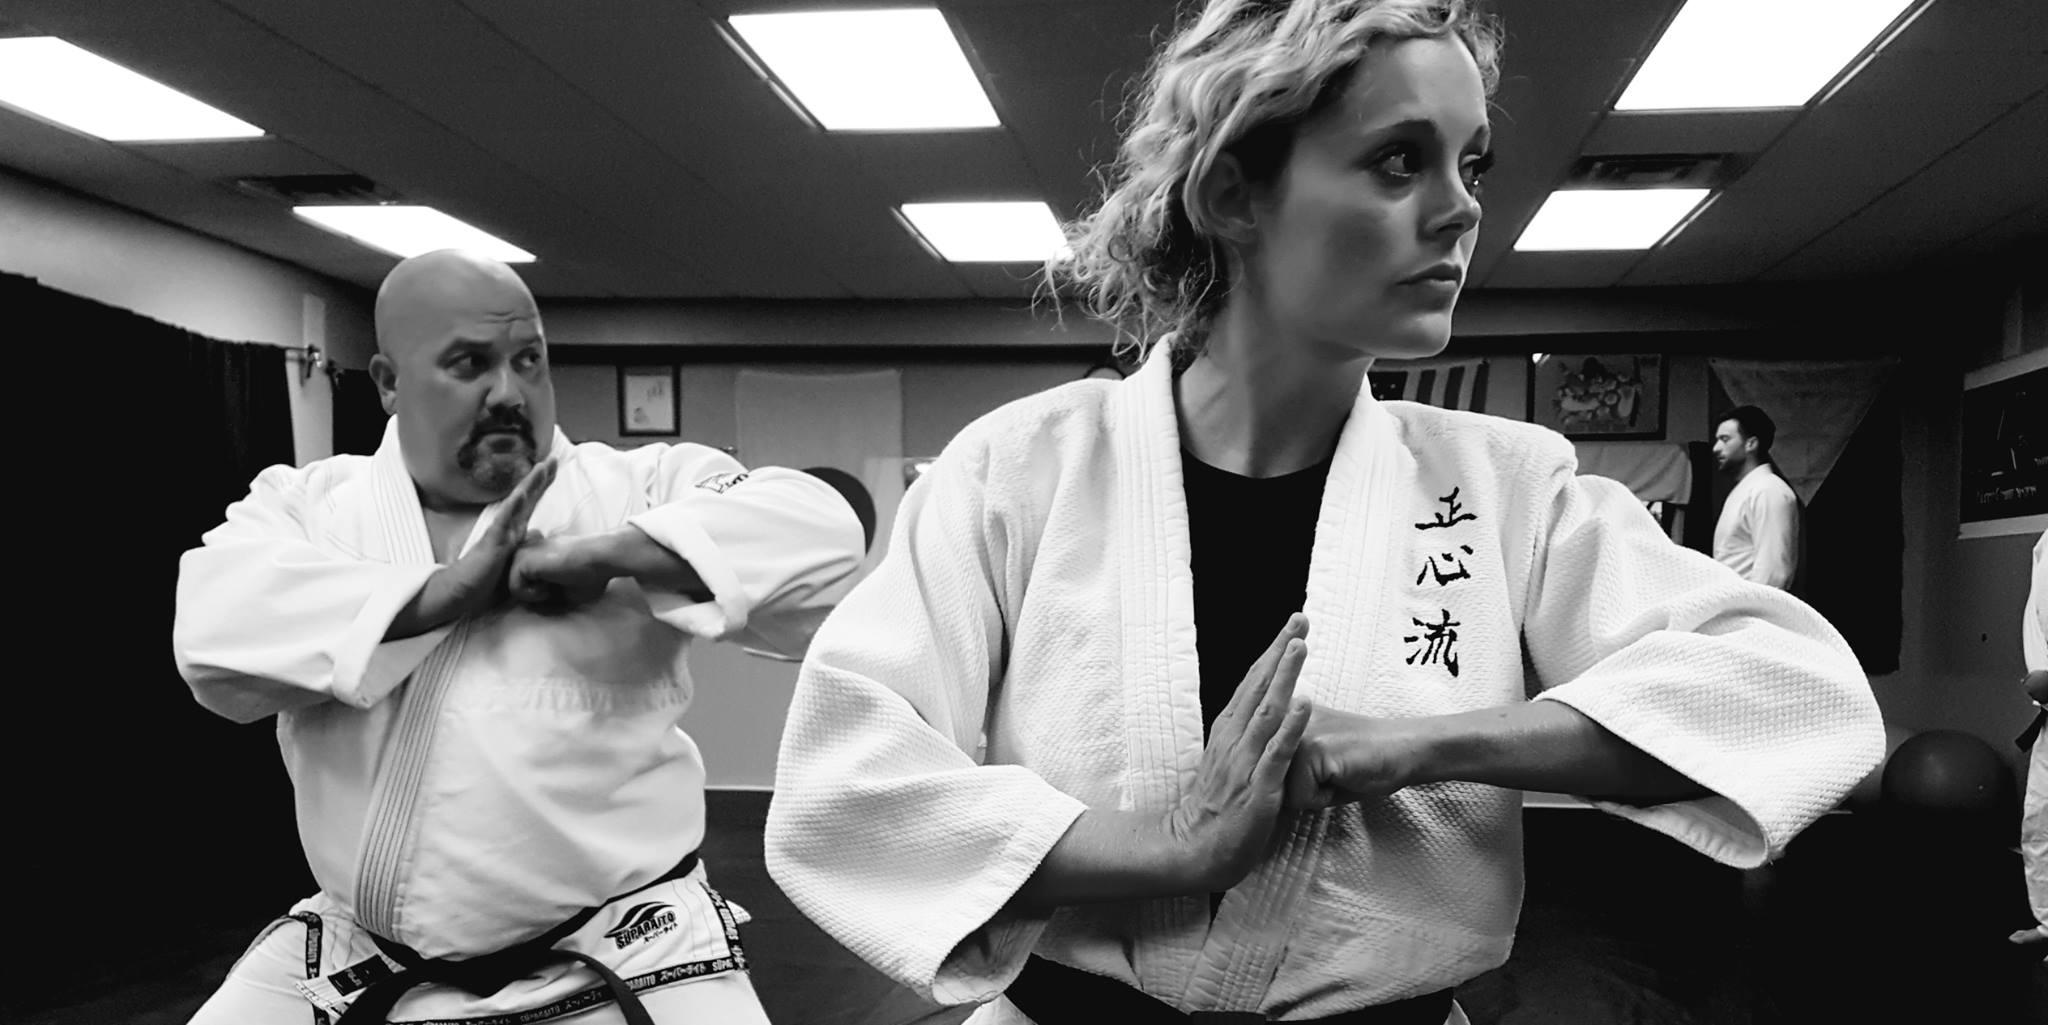 wilmington nc martial arts - sensei esther and jason frick